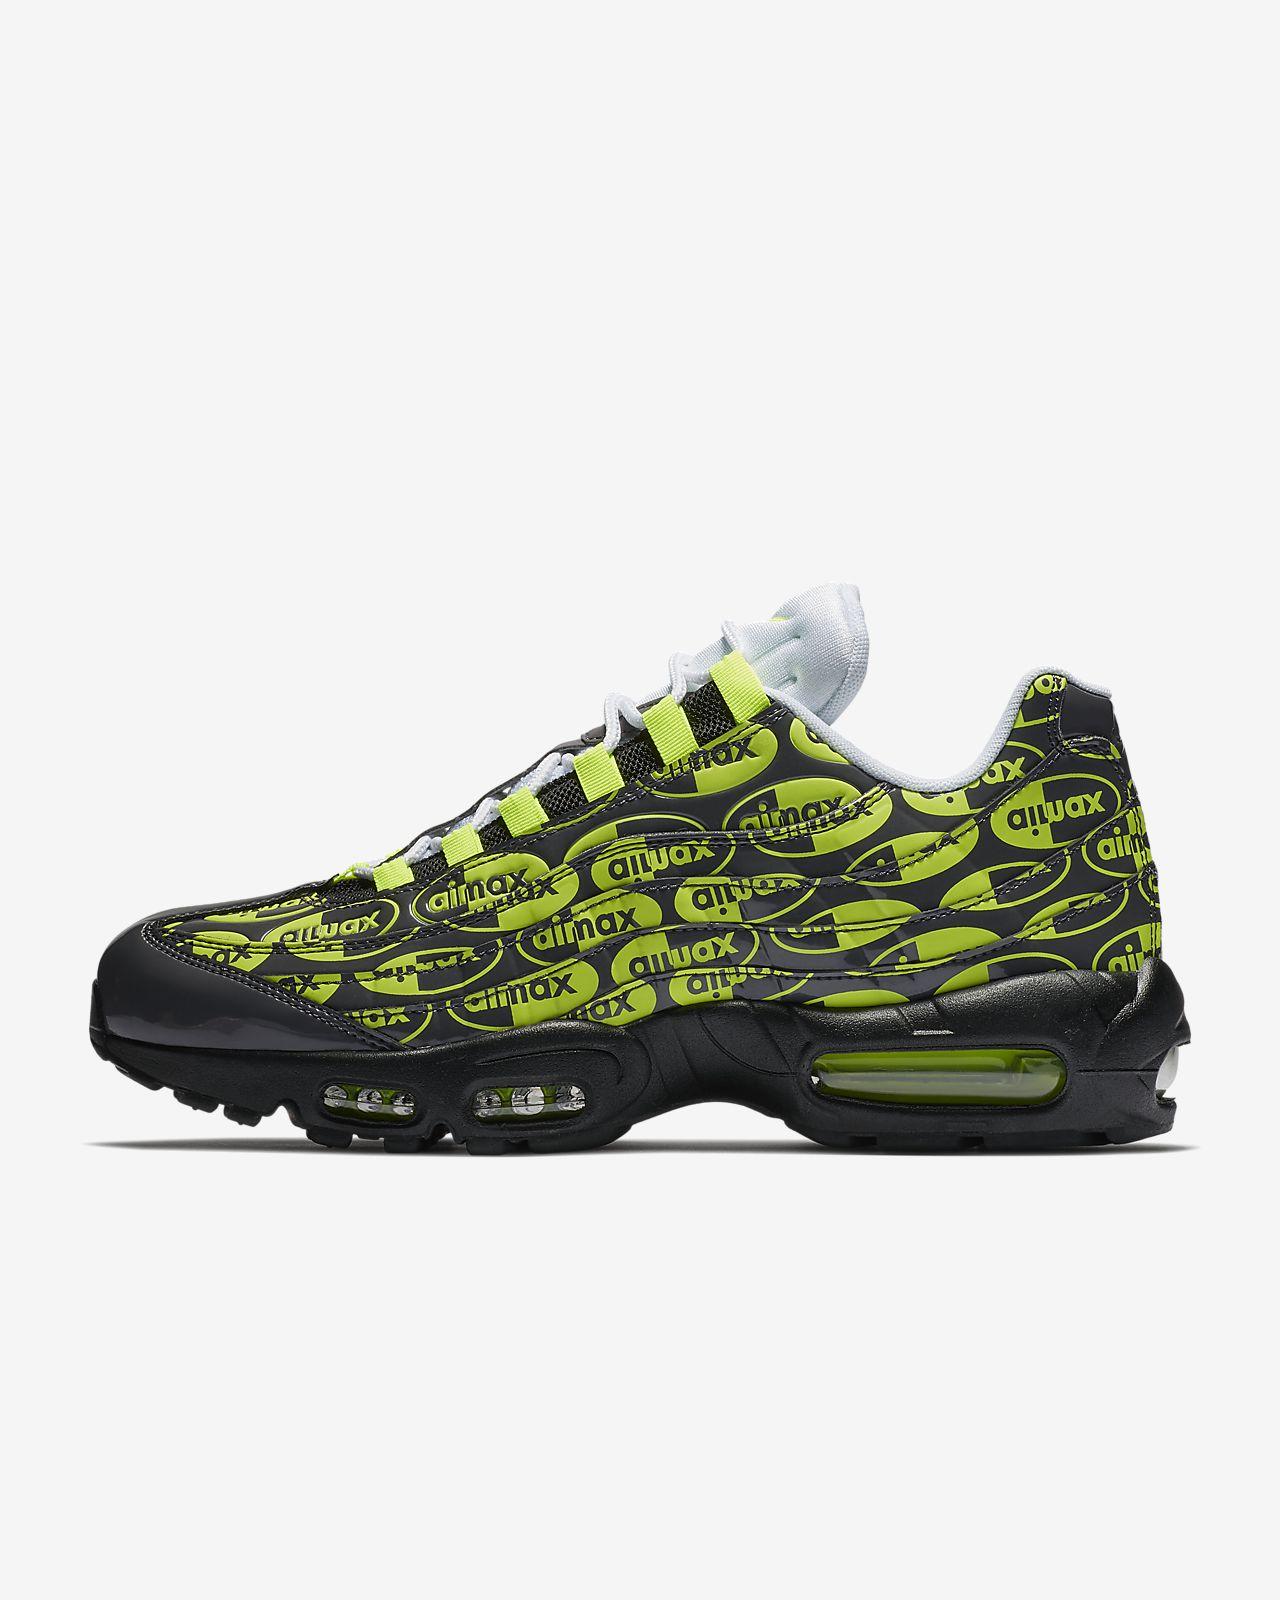 premium selection 23543 03e16 ... Nike Air Max 95 Premium Herenschoen